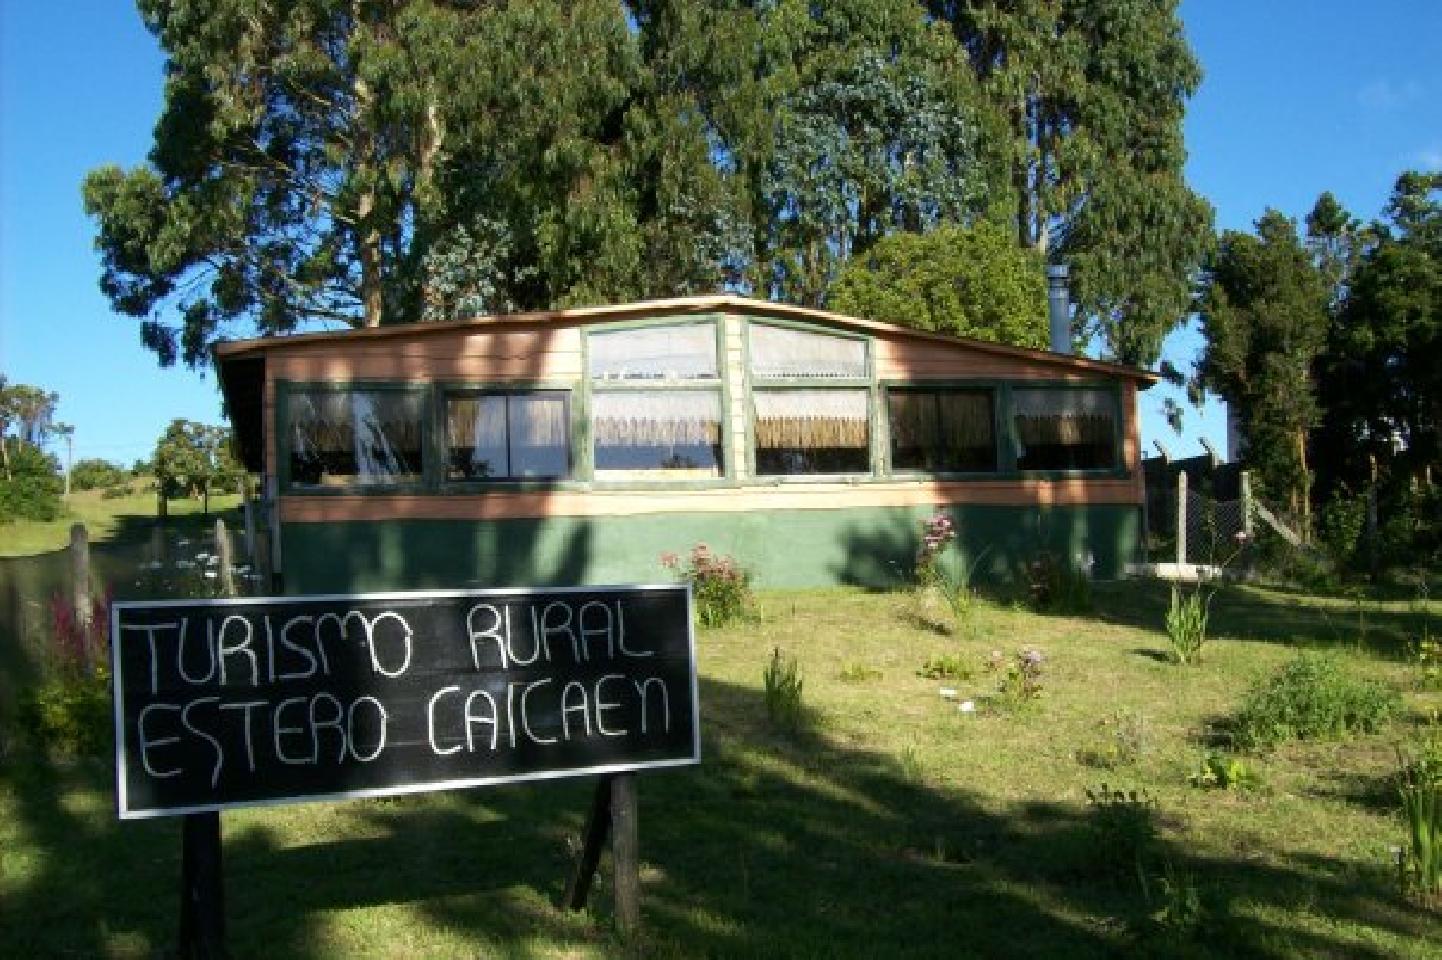 Turismo Rural Estero Caicaen